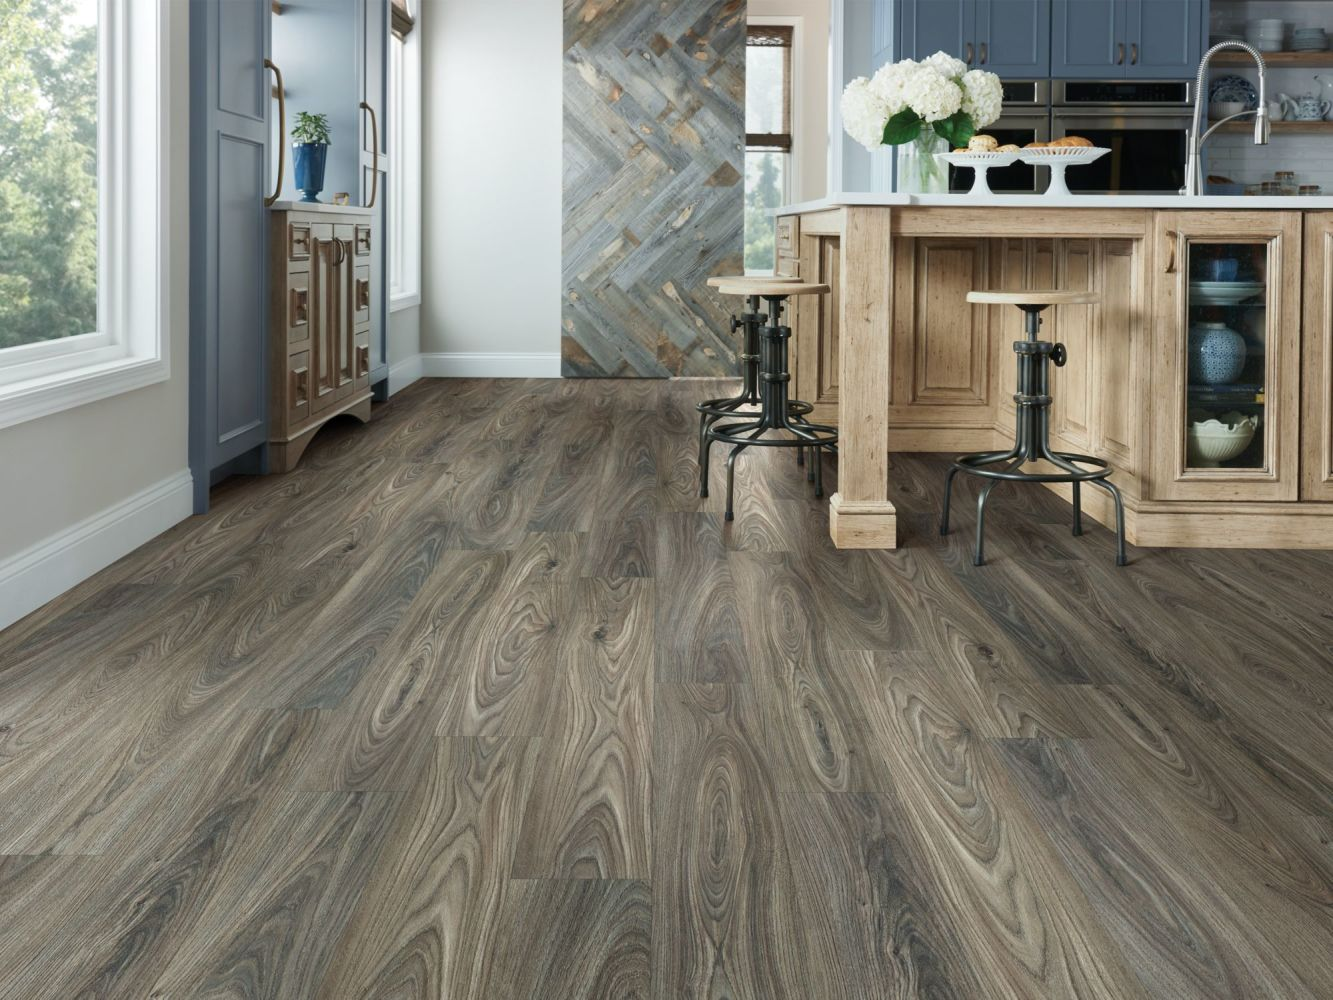 Shaw Floors Clayton Homes Augusta Dark Elm 00915_C172Y